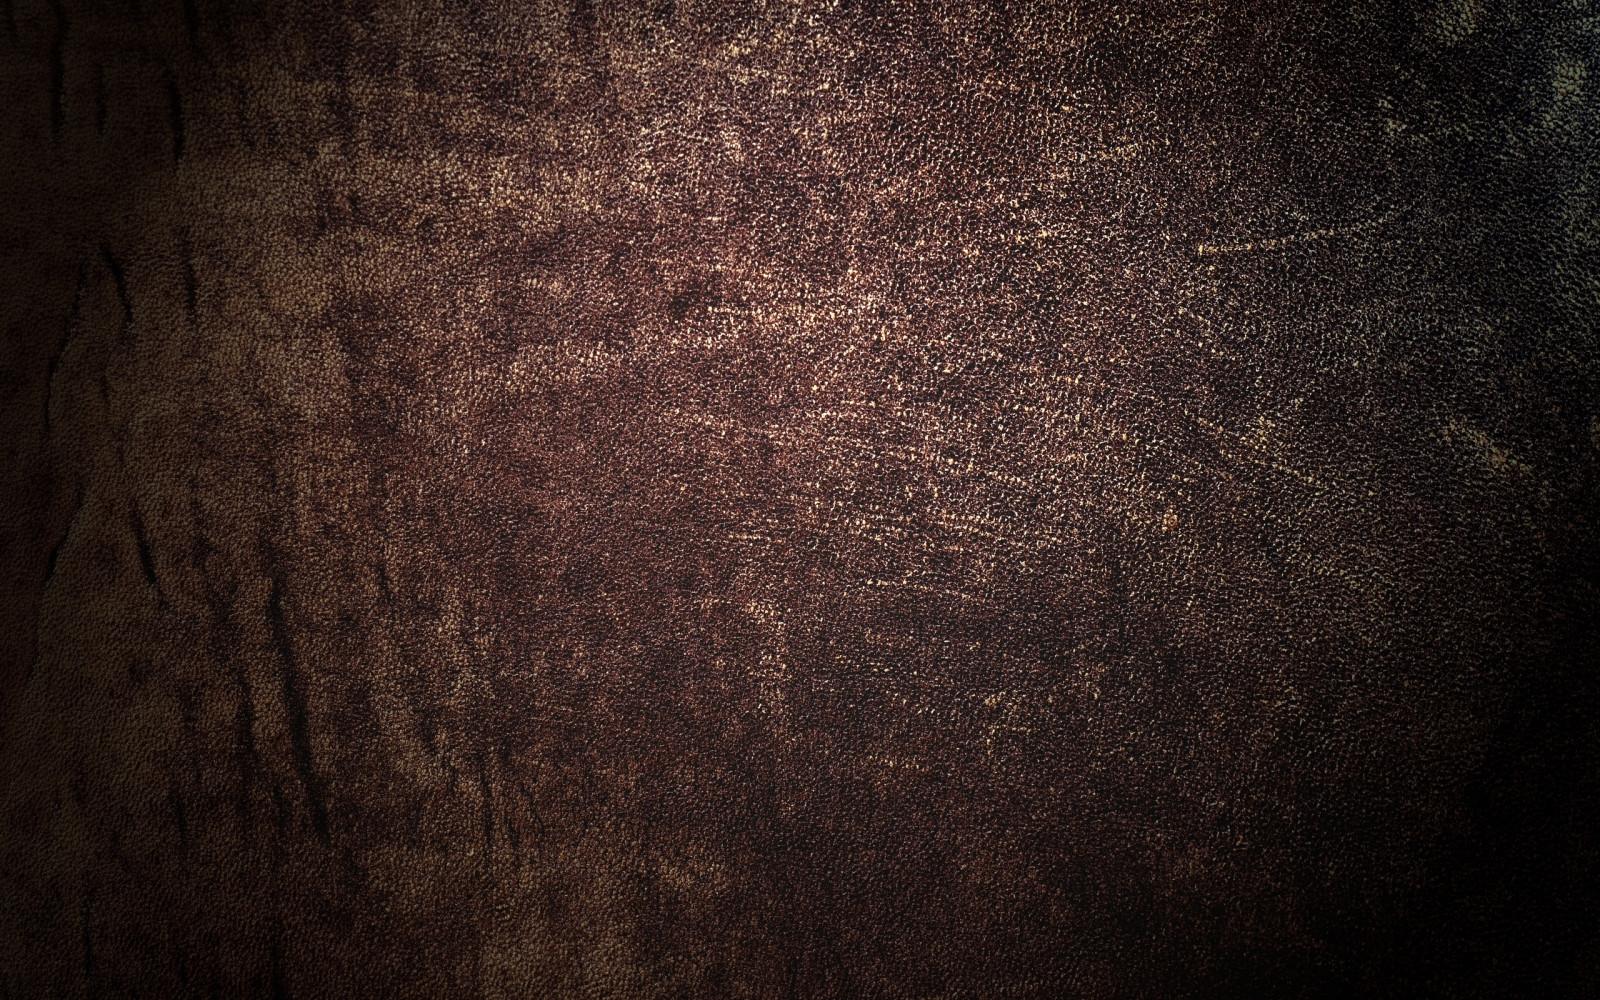 Fond d'écran : peau, texture, cuir, marron 2560x1600 ... - photo#9